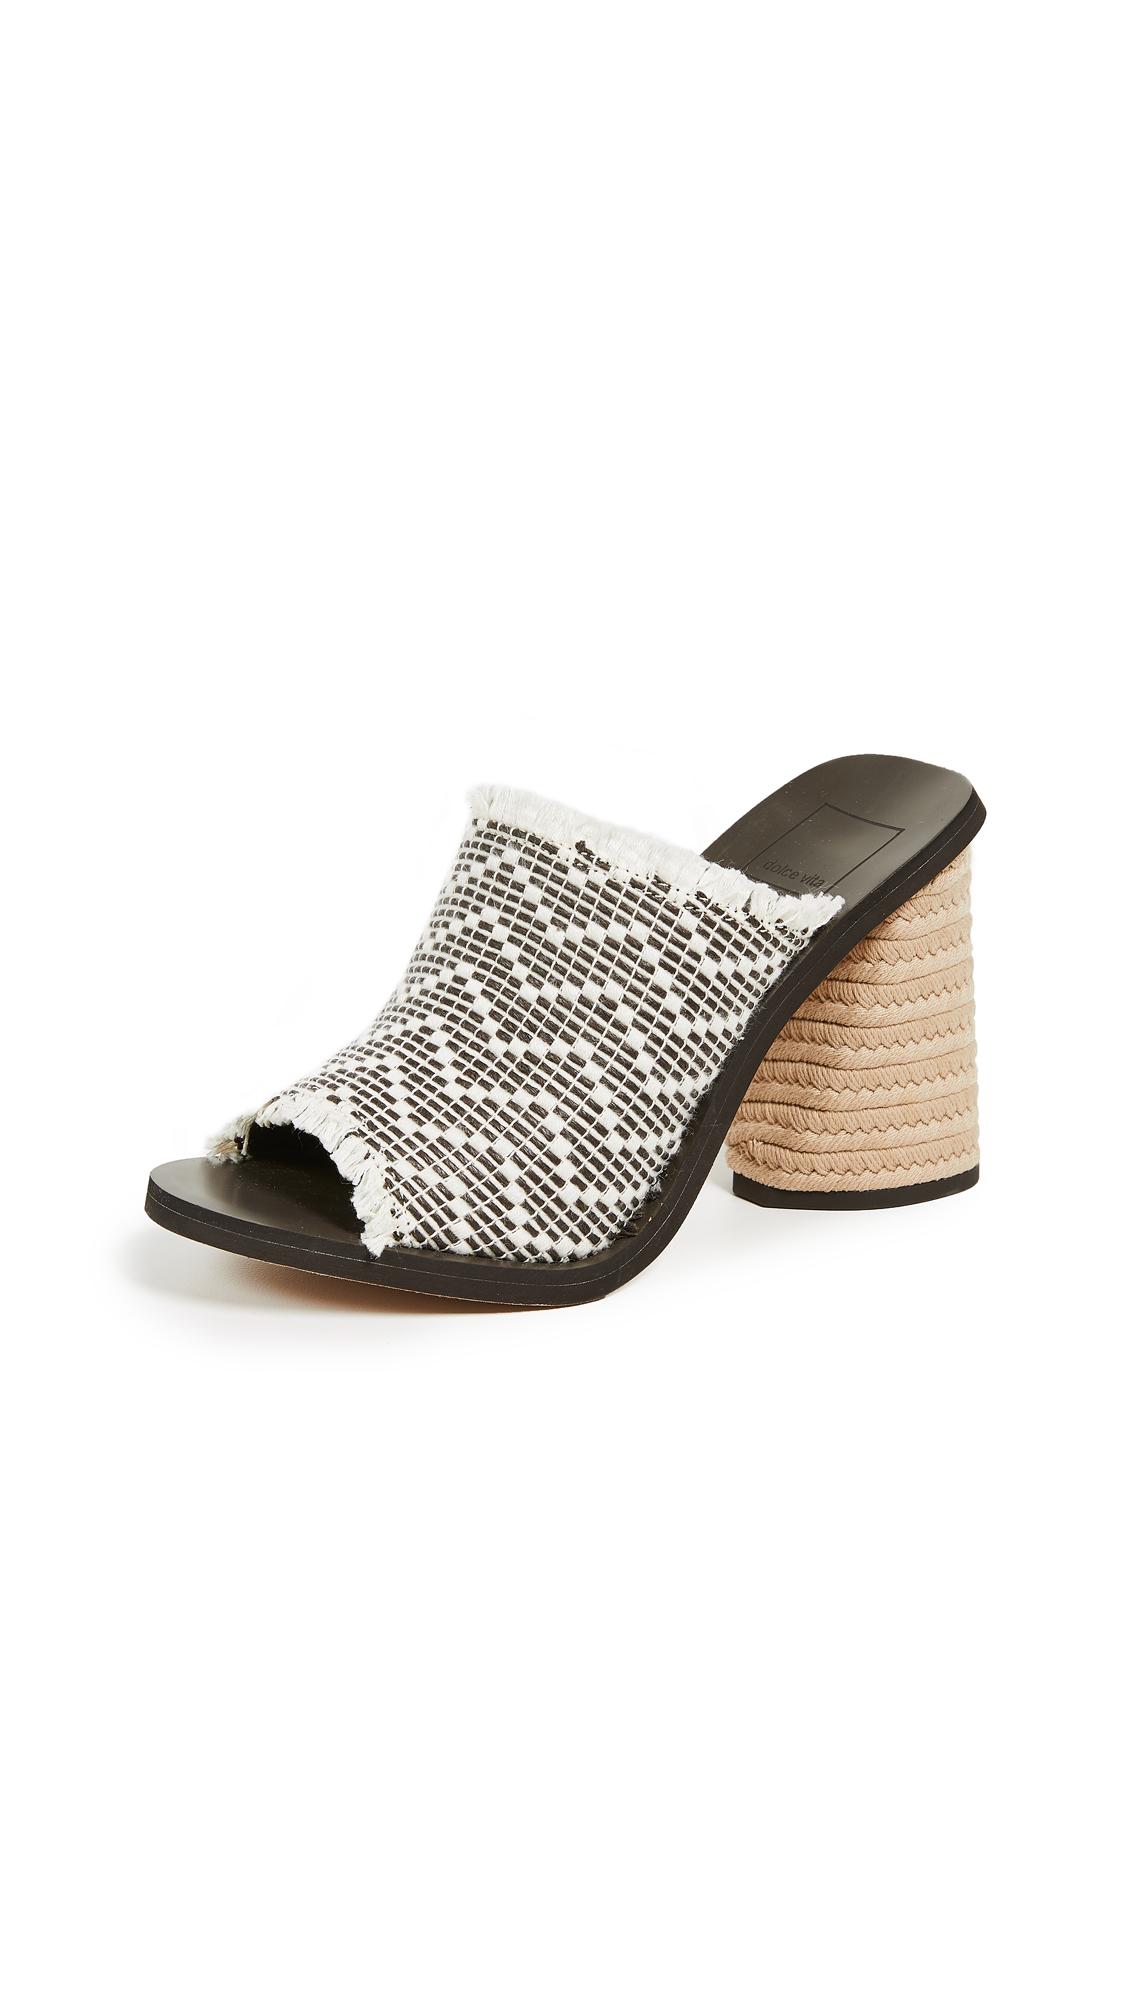 Dolce Vita Alba Block Heel Sandals - Black/White